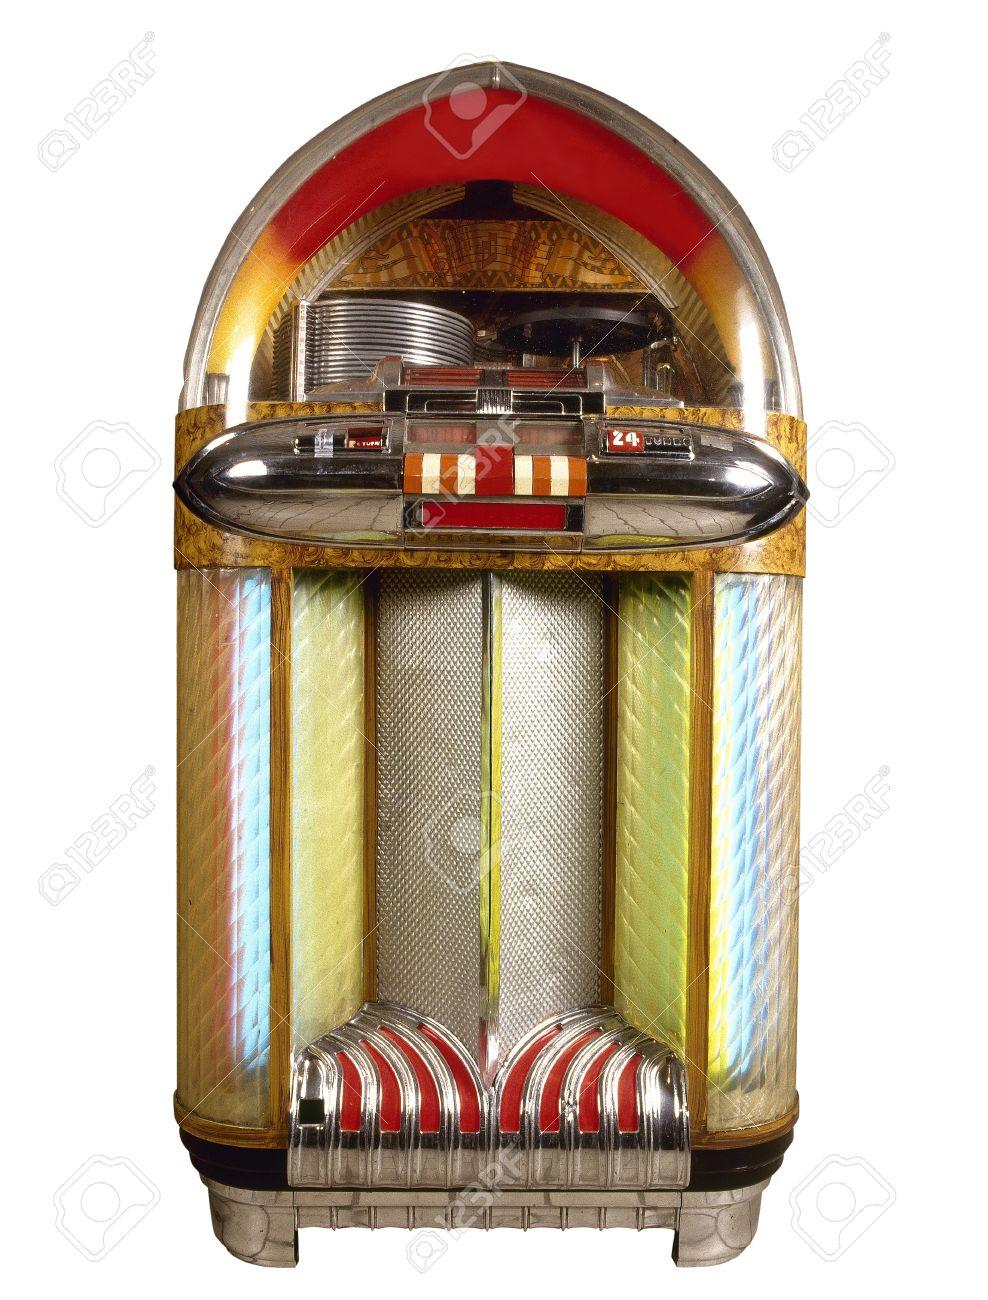 Old Jukebox Music Player Isolated On White Background Stock Photo